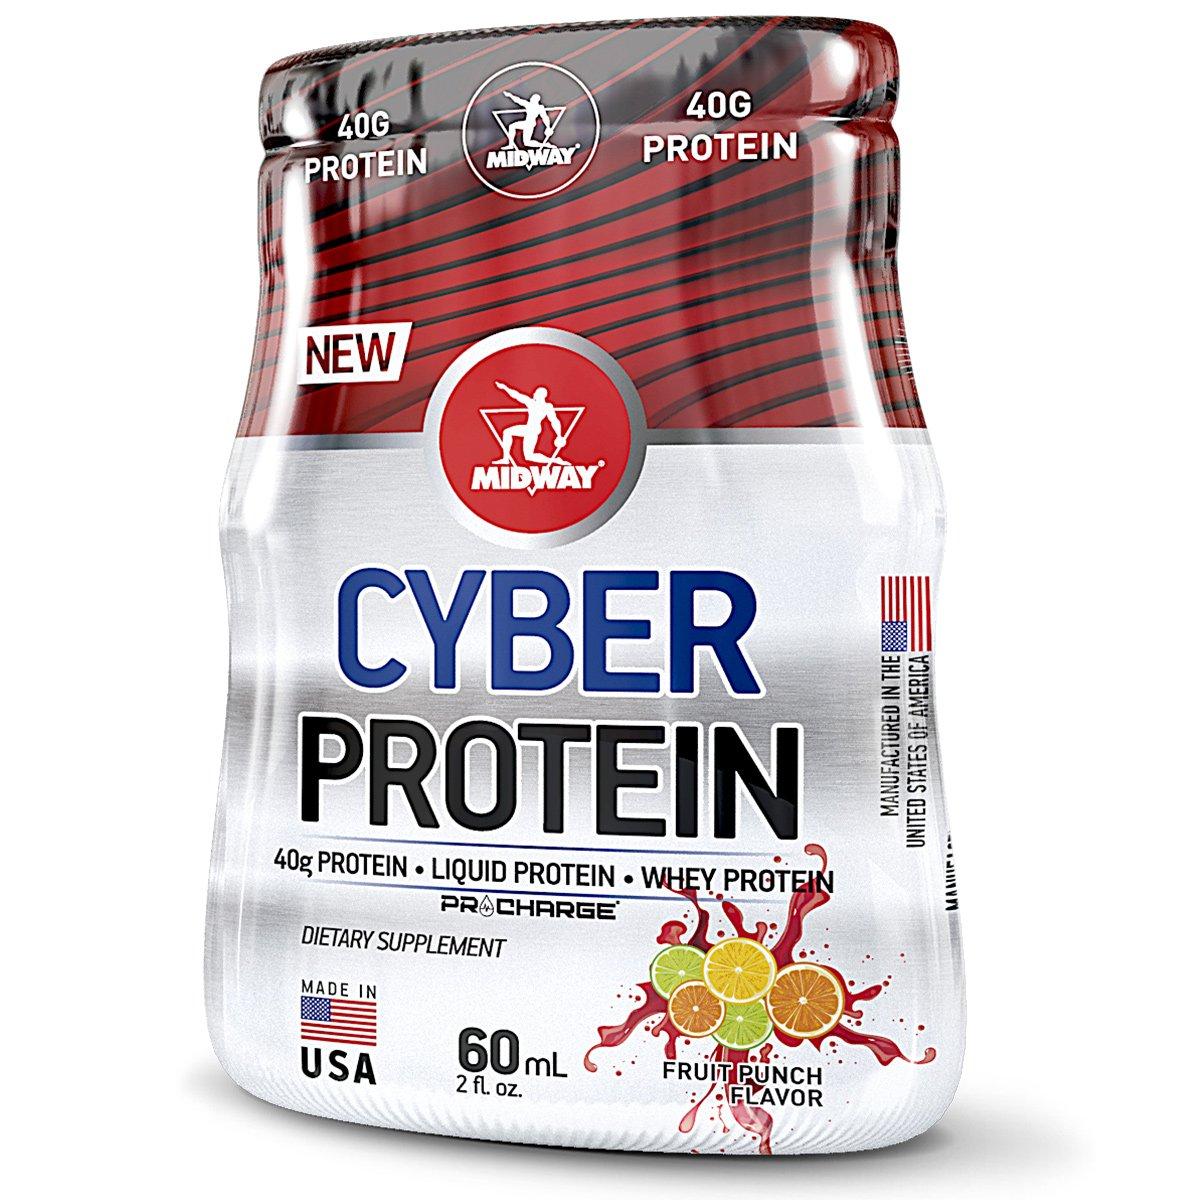 ... Cyber Protein Proteína Líquida Isolada com colágeno Hidrolisado  Midway  USA 60ml c  12 Unidades ... 29b60faf79dab